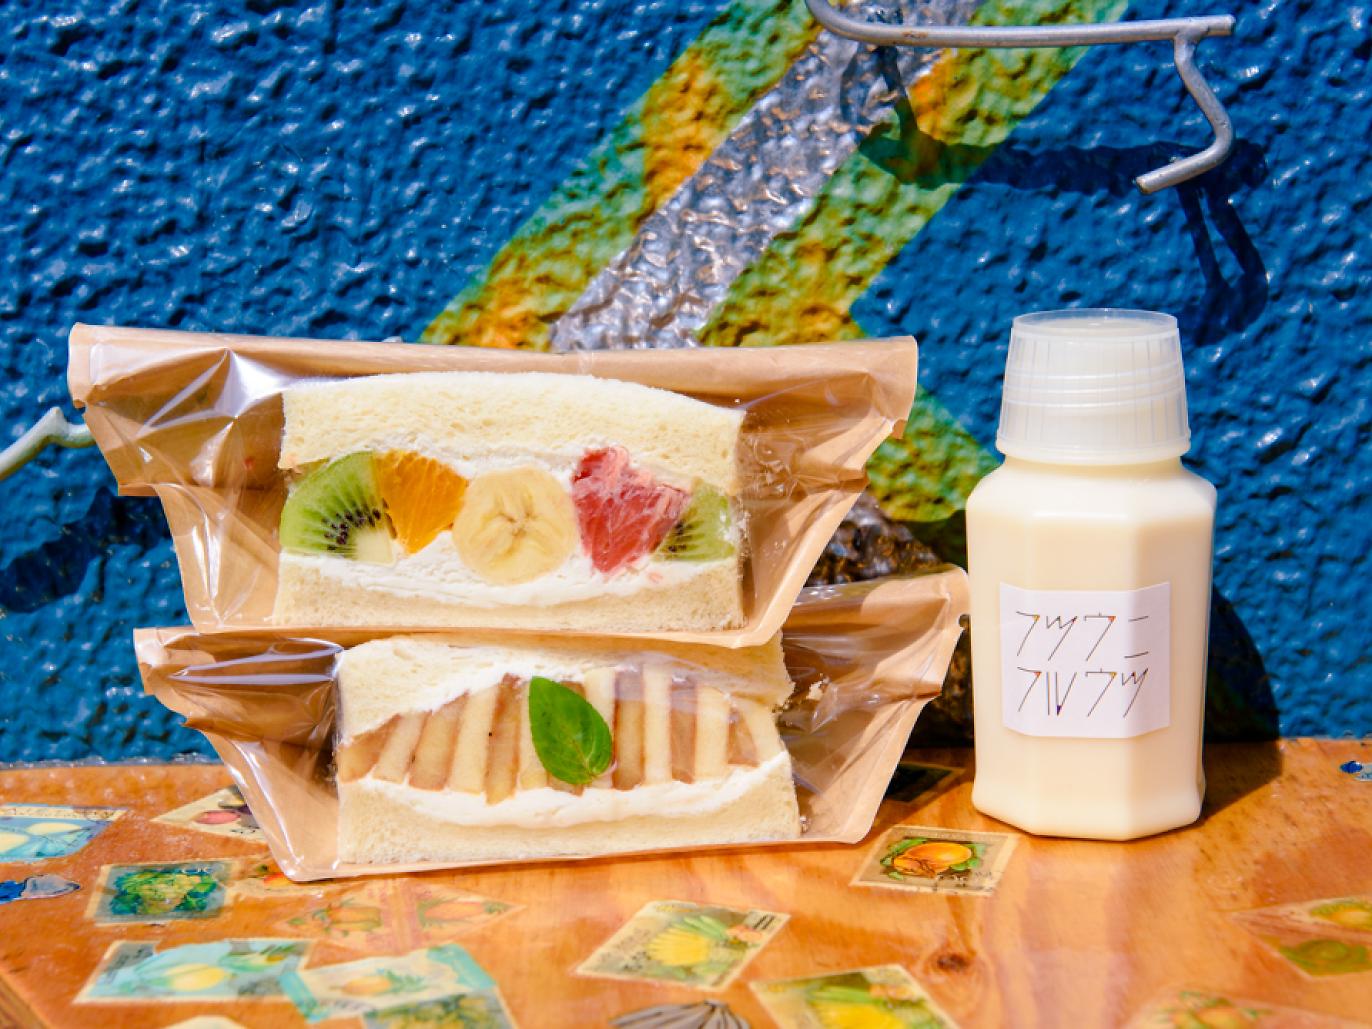 Mencicipi Lezatnya Sandwich Buah Apik dari Futsu ni Fruits image